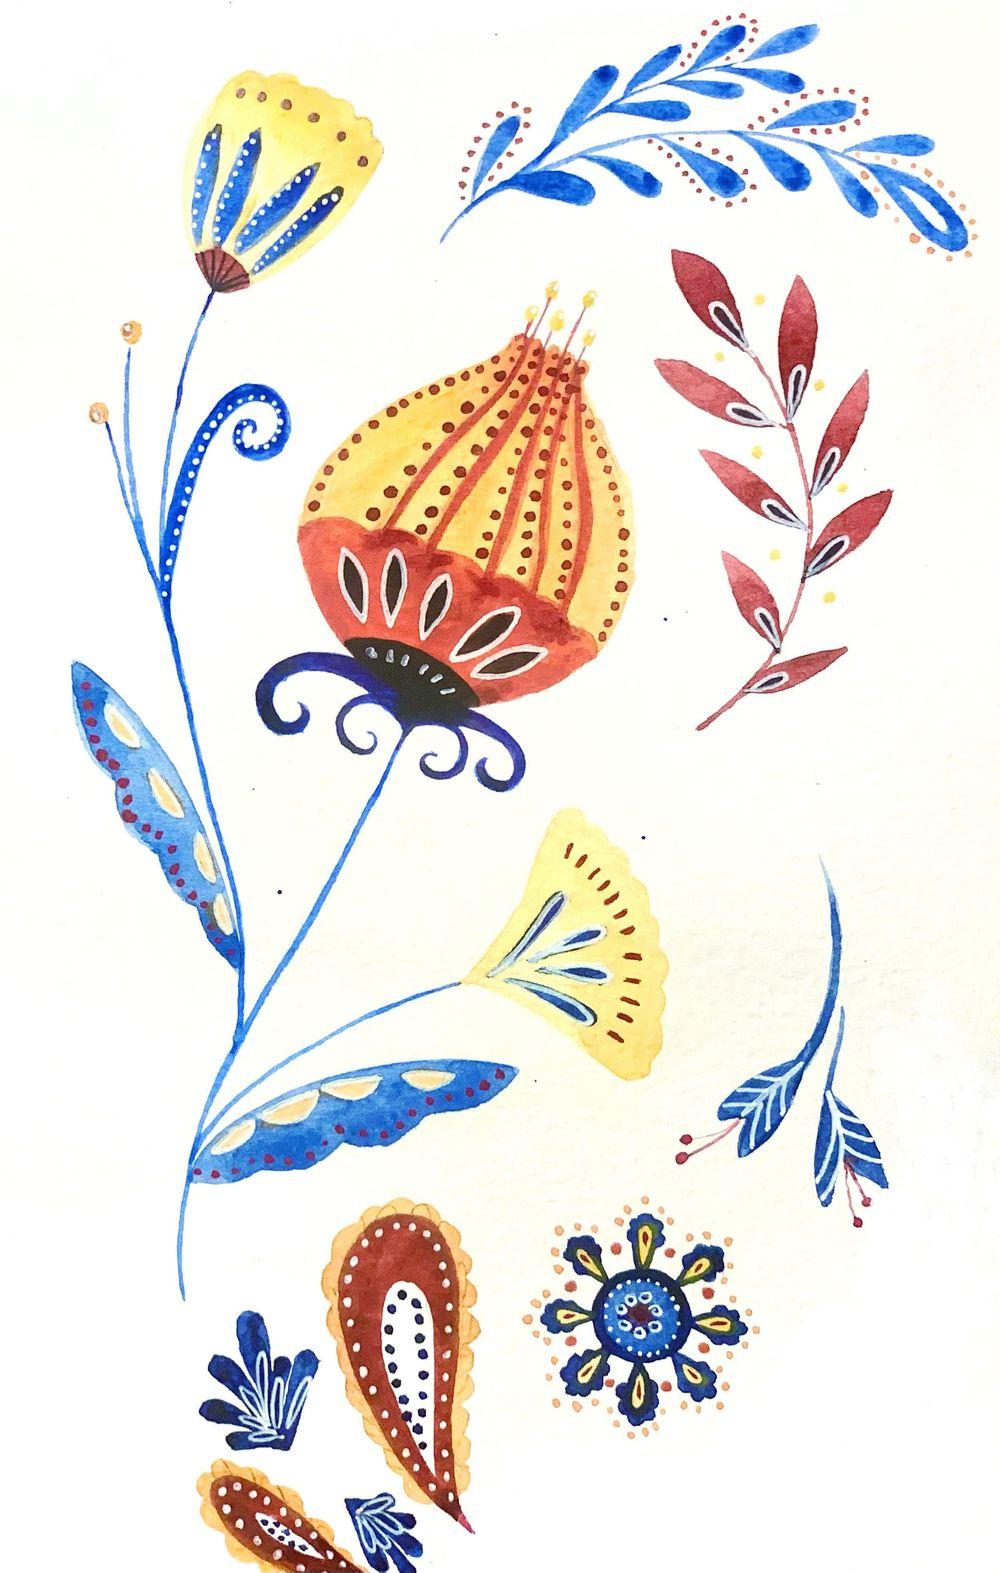 Folk Art, watercolor - image 1 - student project